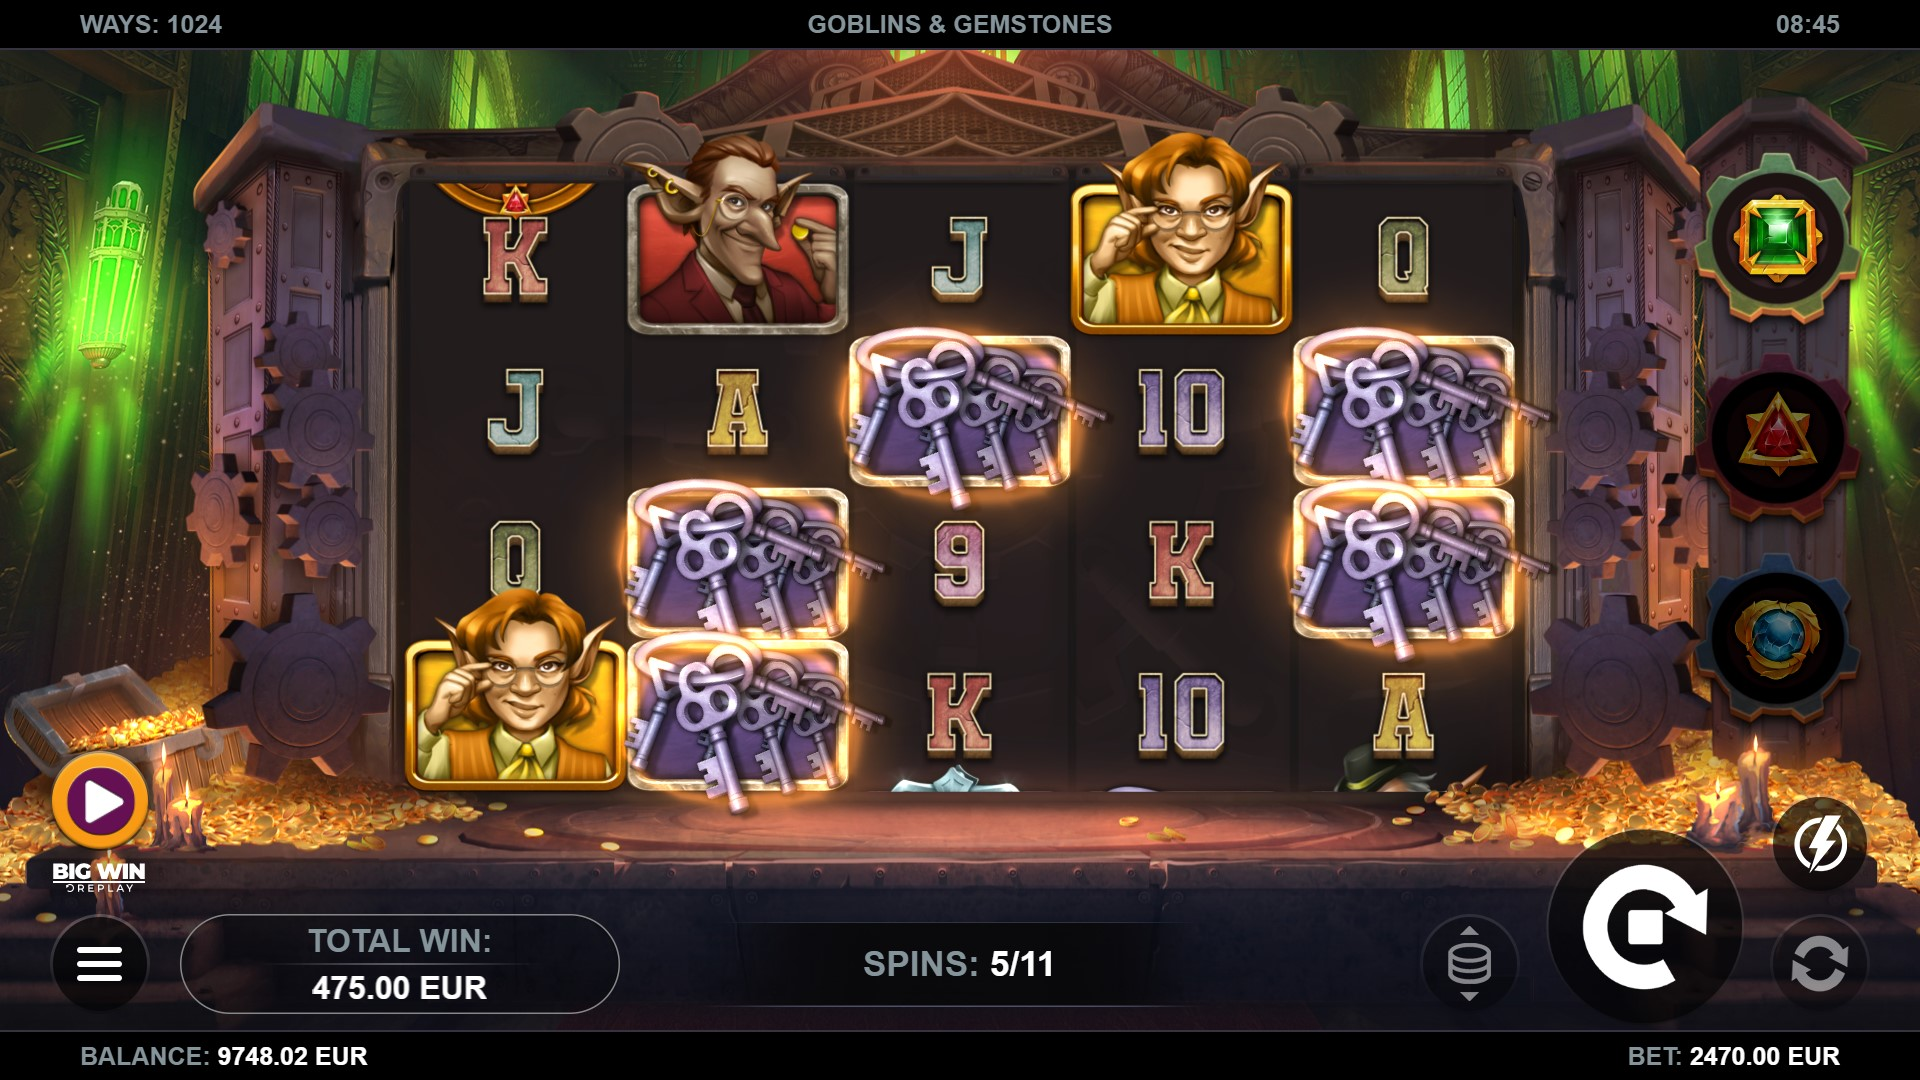 Goblins & Gemstones Screenshot